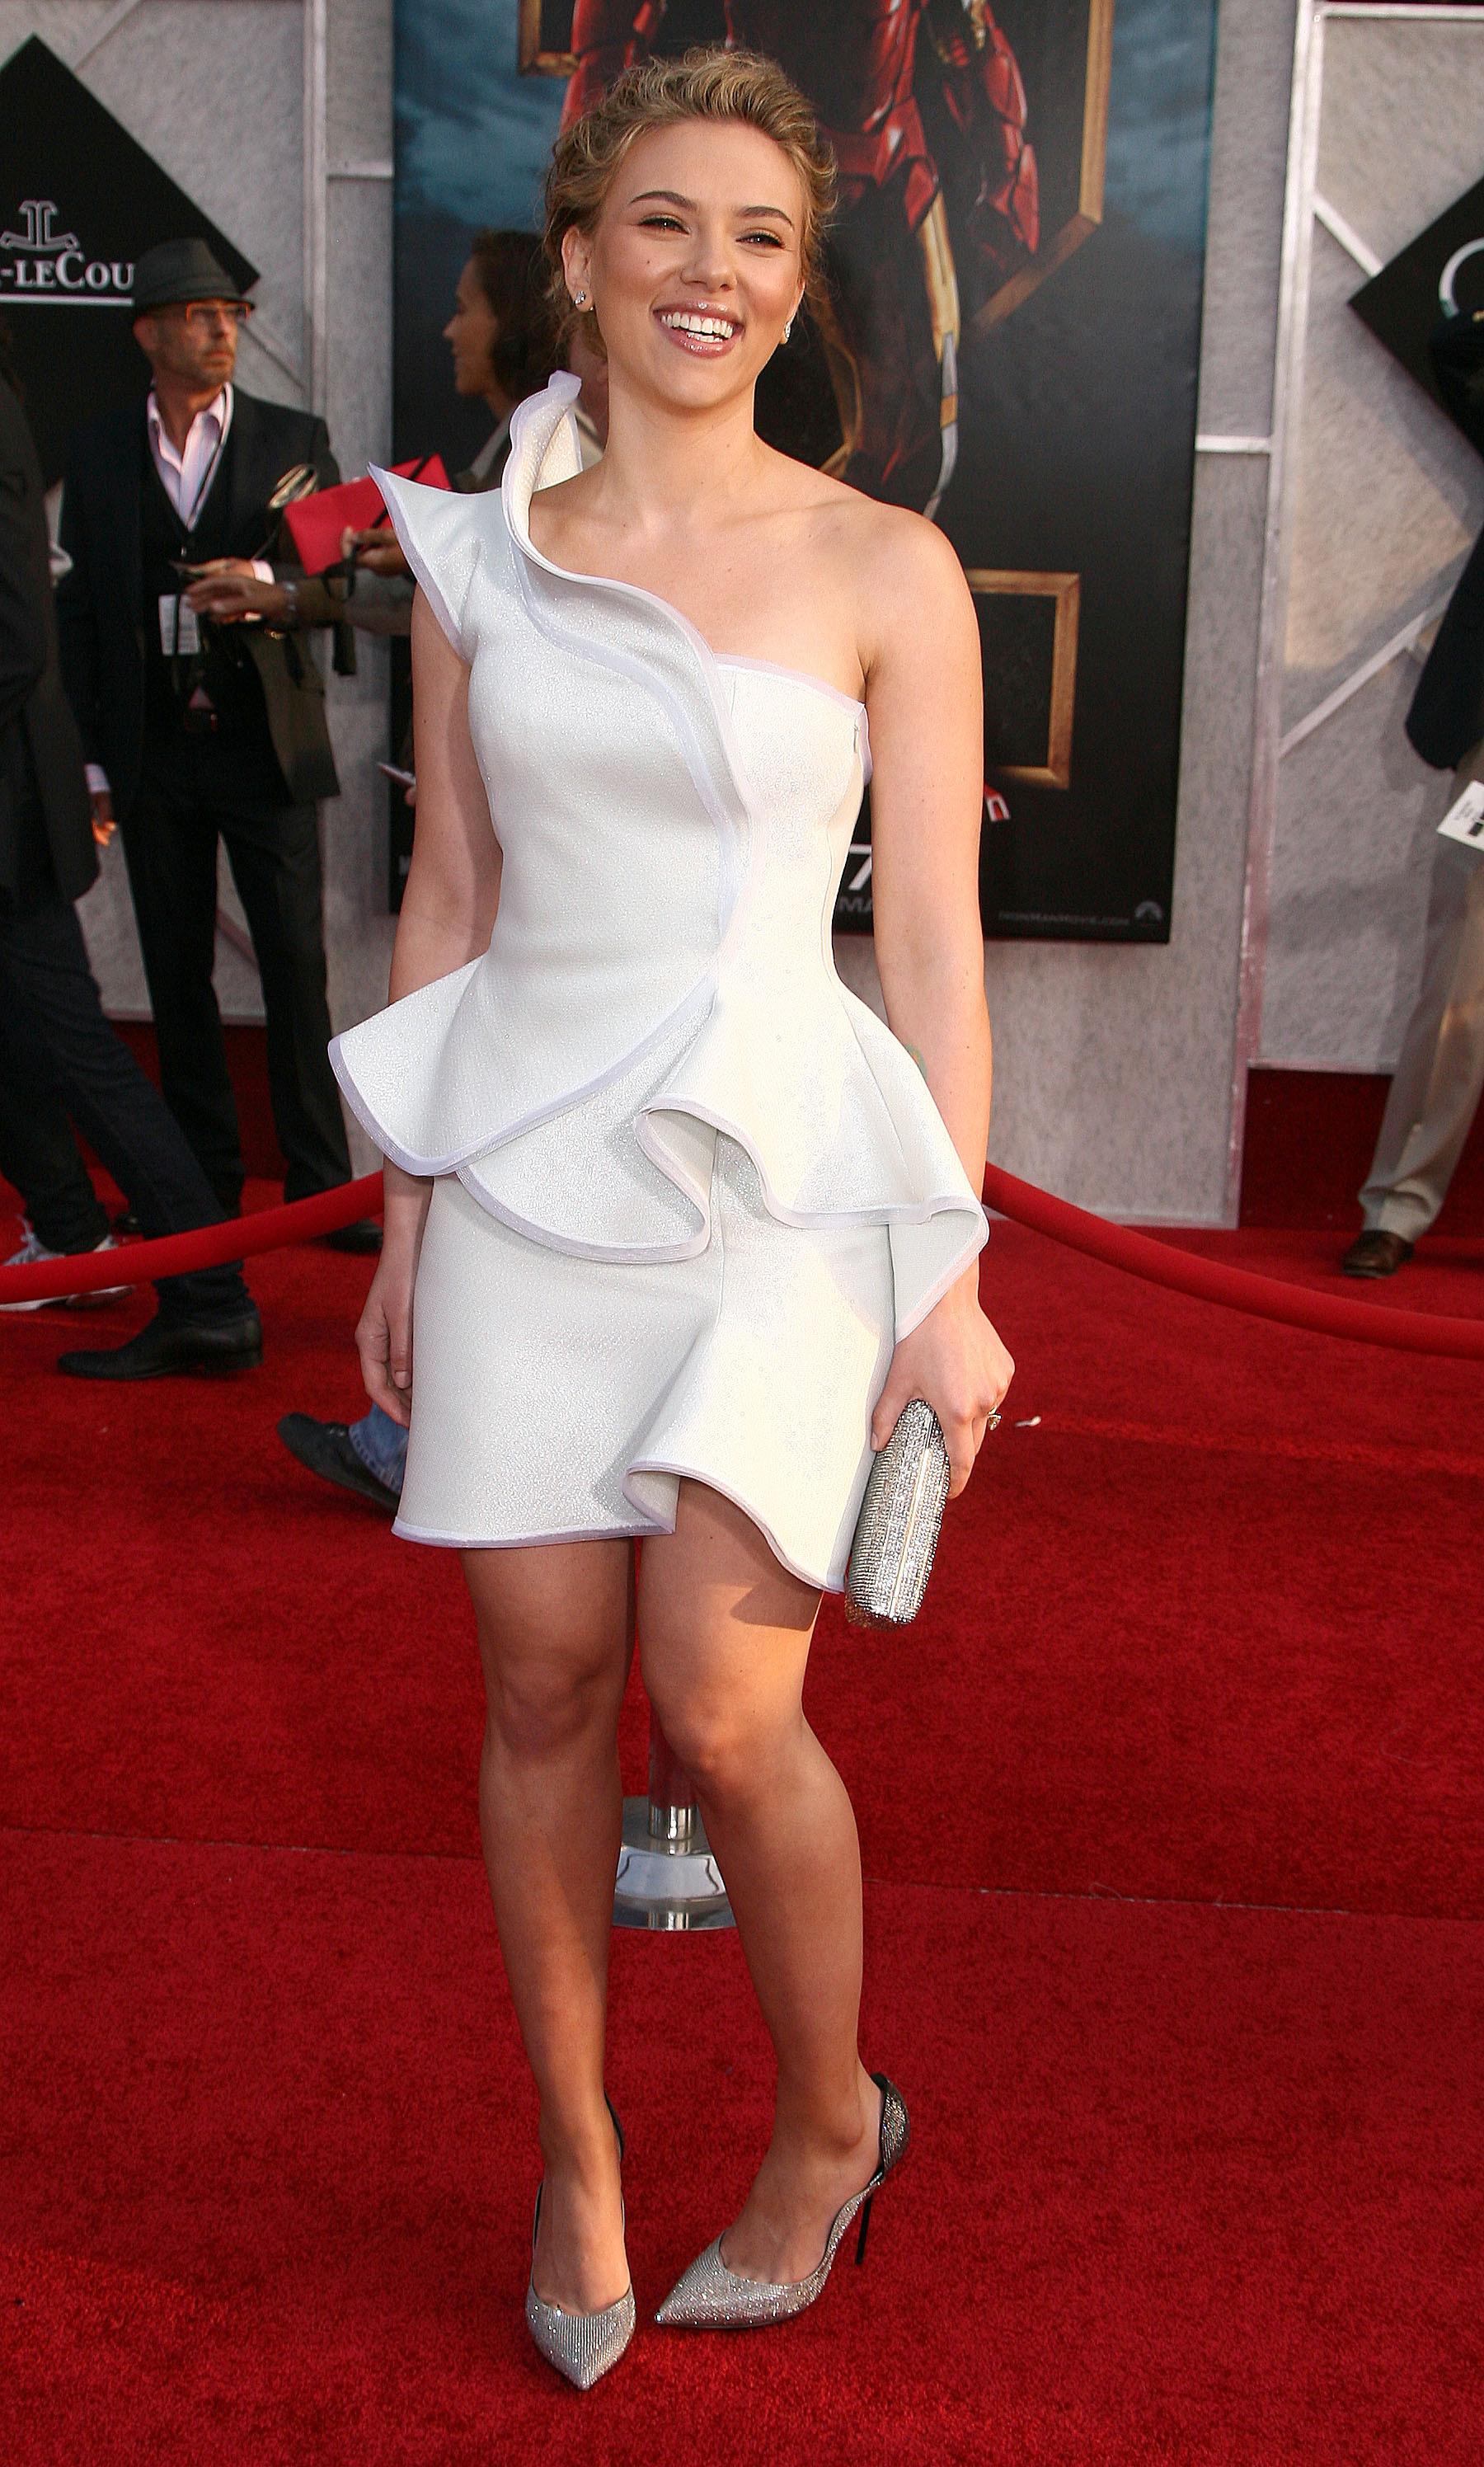 50724_celebrity_paradise.com_Scarlett_Johansson_Iron_Man_2_World_Premiere_in_Hollywood_26.04.2010_16_122_888lo.jpg